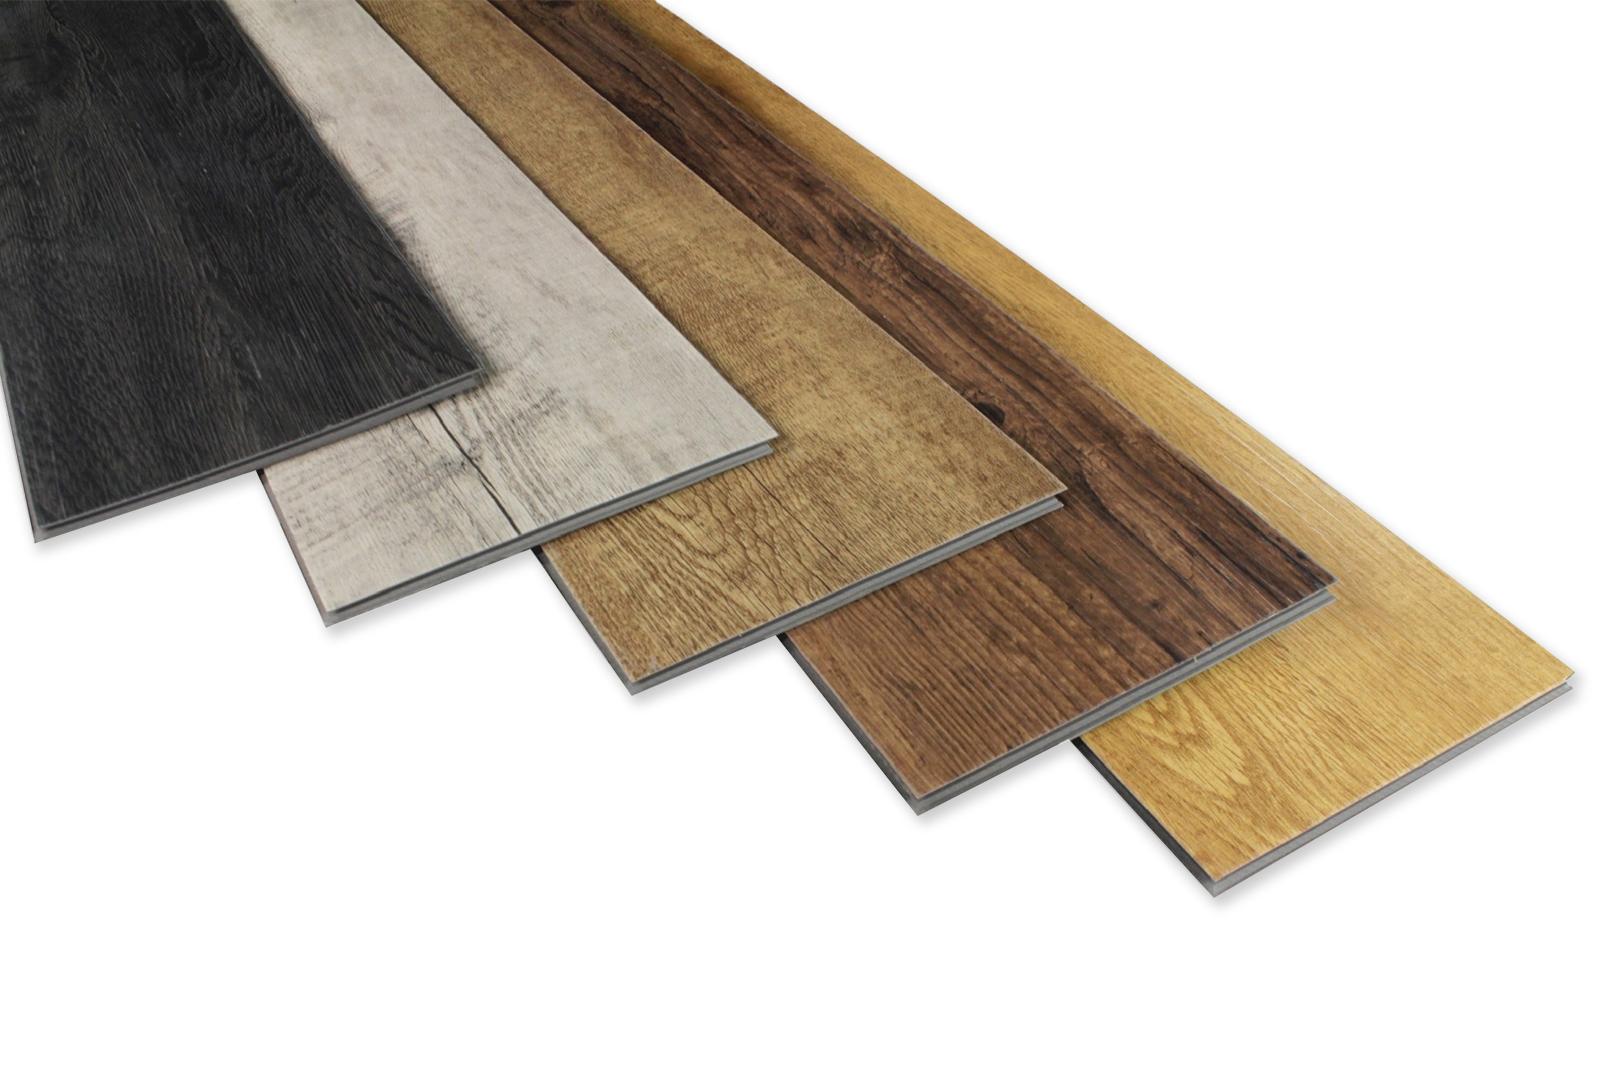 Einzigartig Muster Musterstücke Vinylboden Uniclic Dielen Klick Vinyl Laminat  AE28